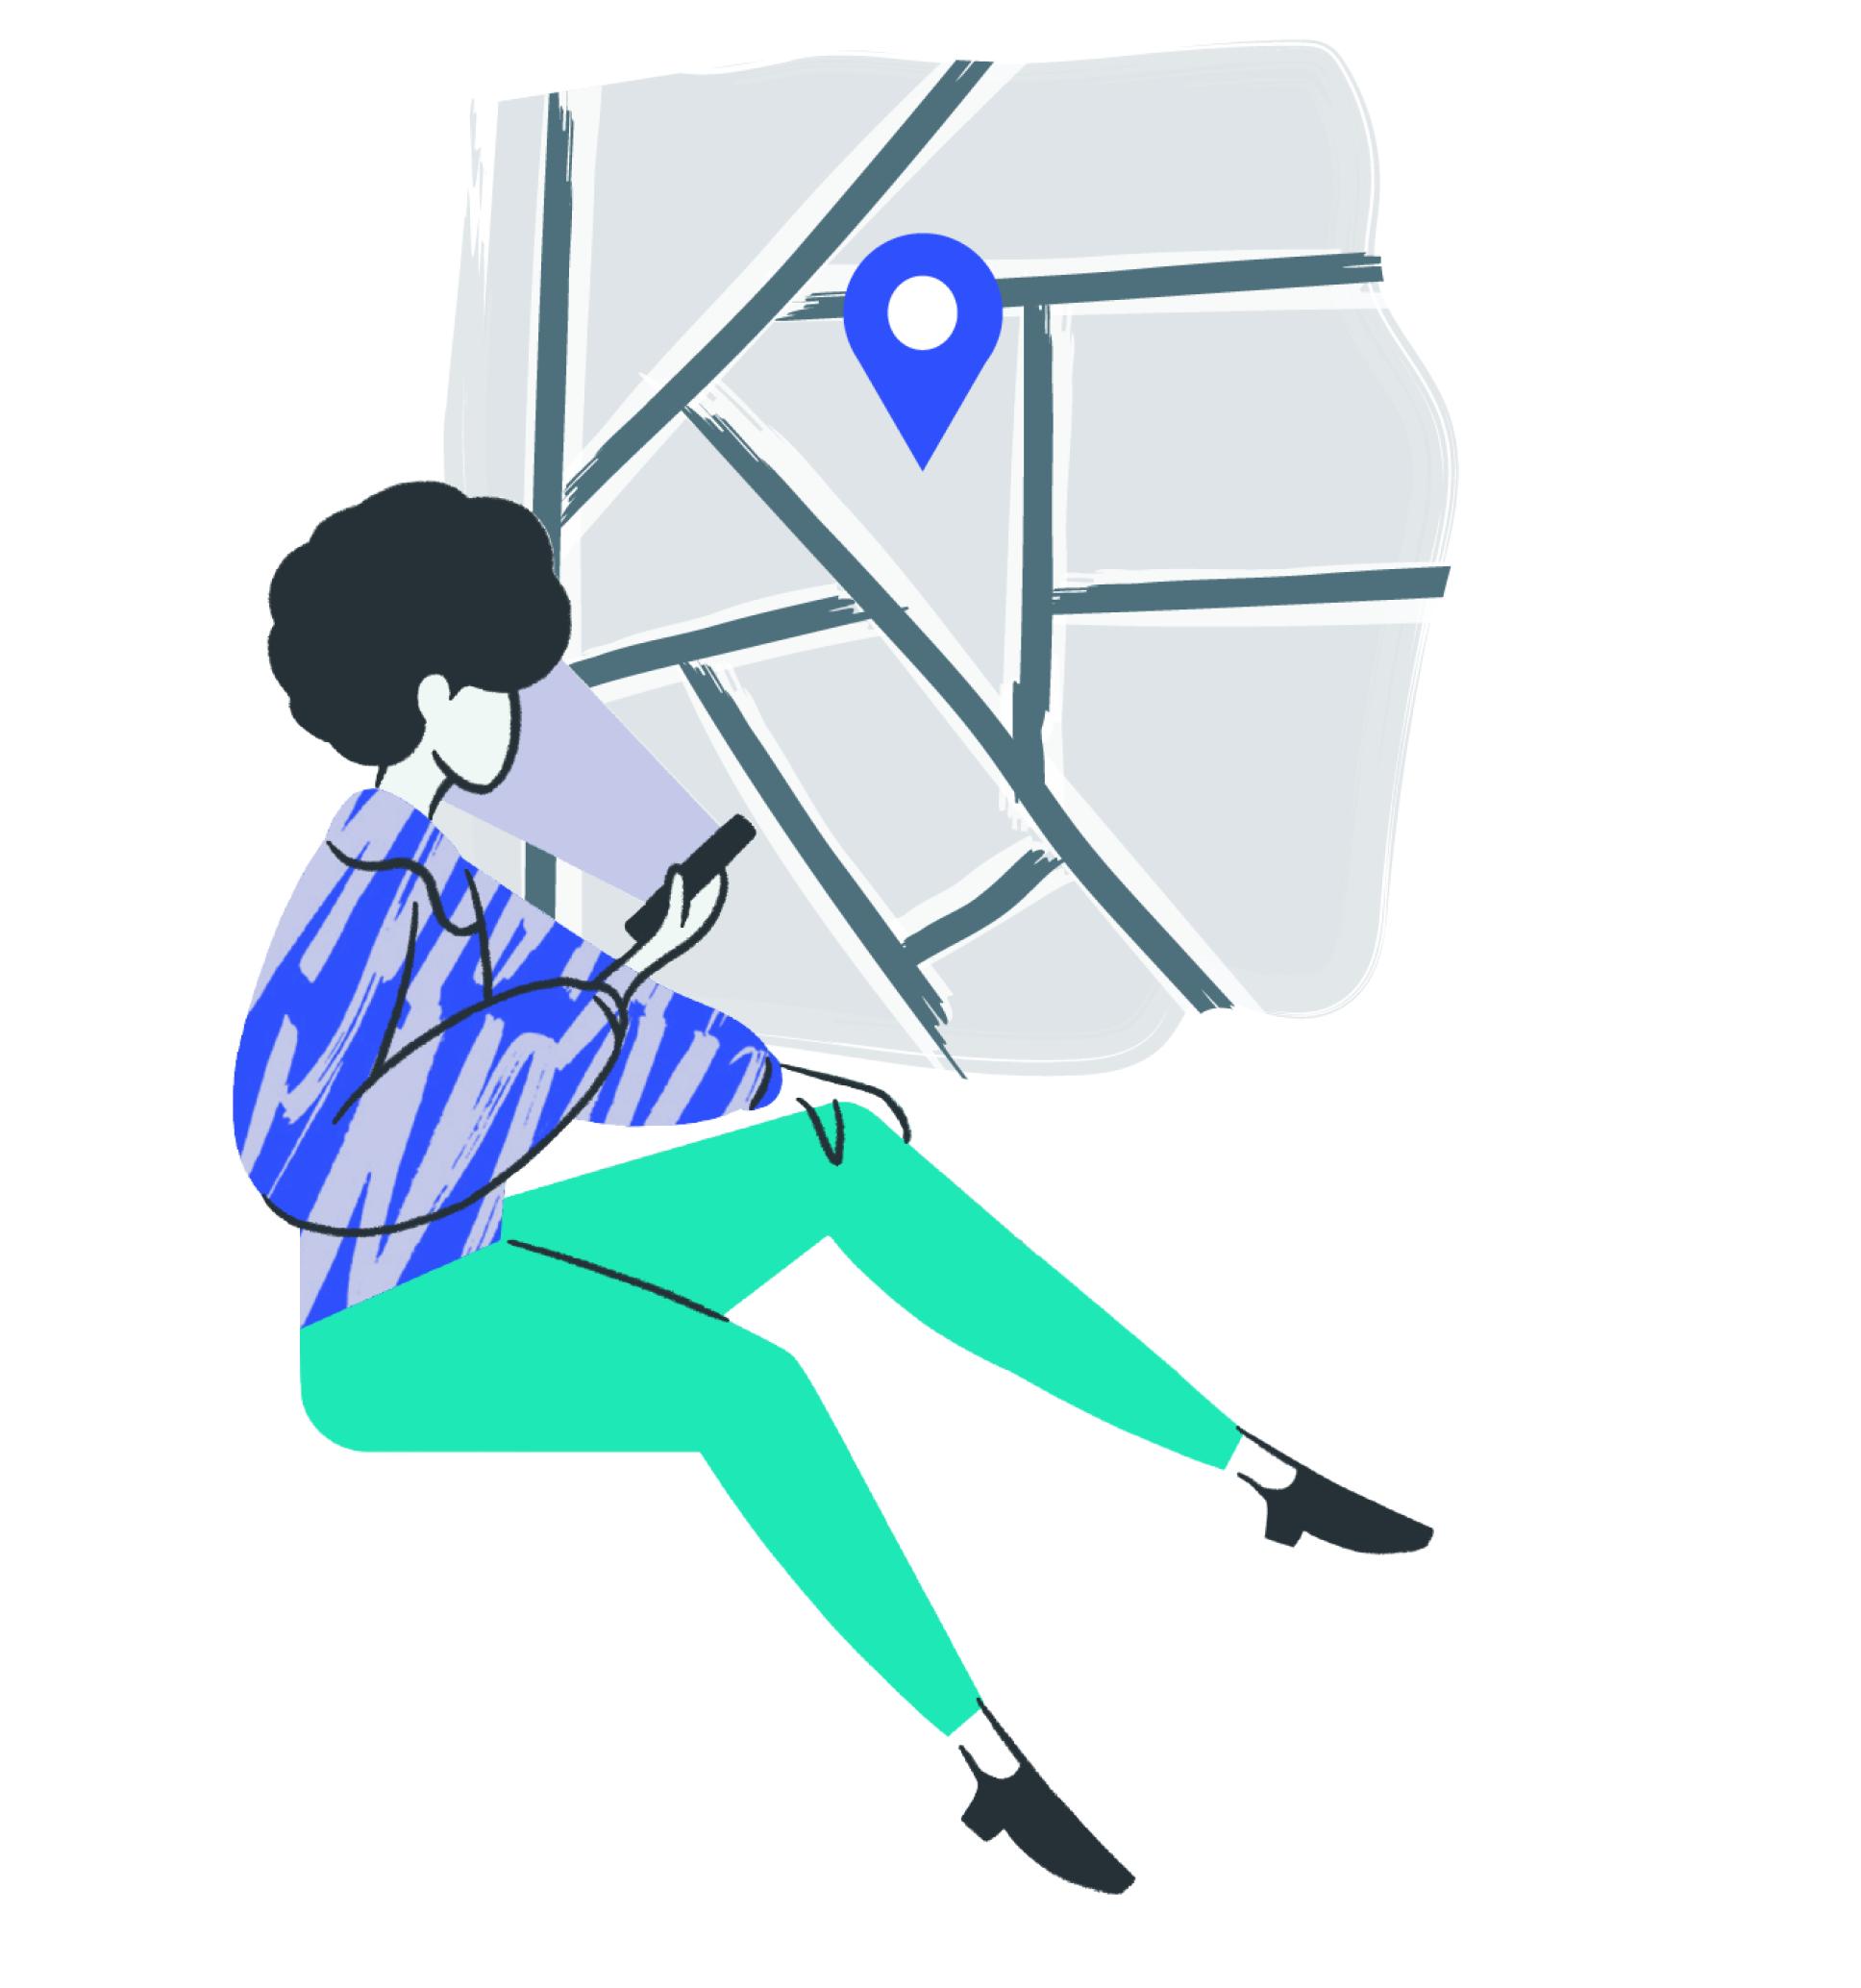 Women on map illustration 2.0